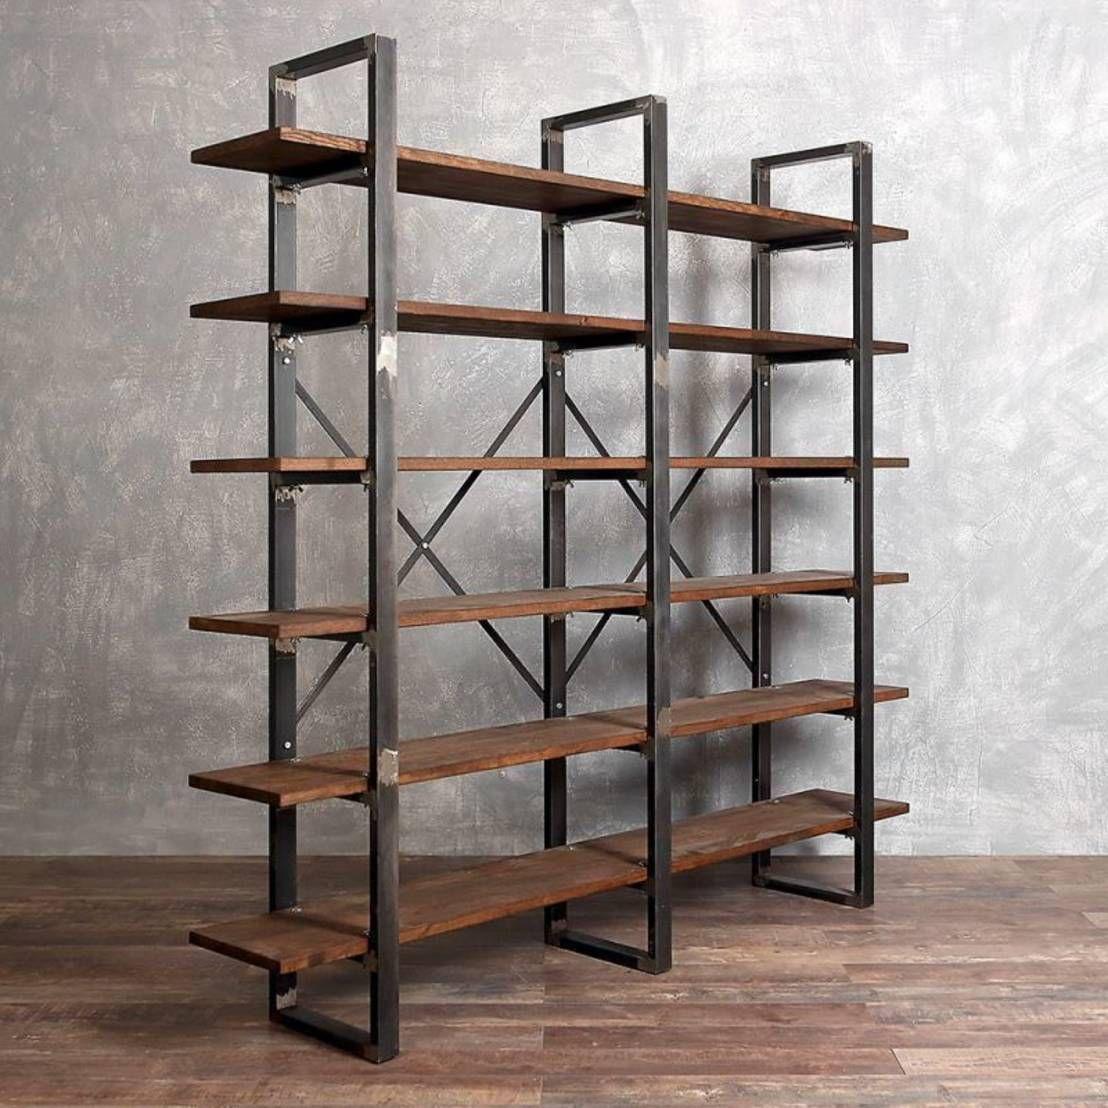 Loft Furniture industrial style ZSLLCBG